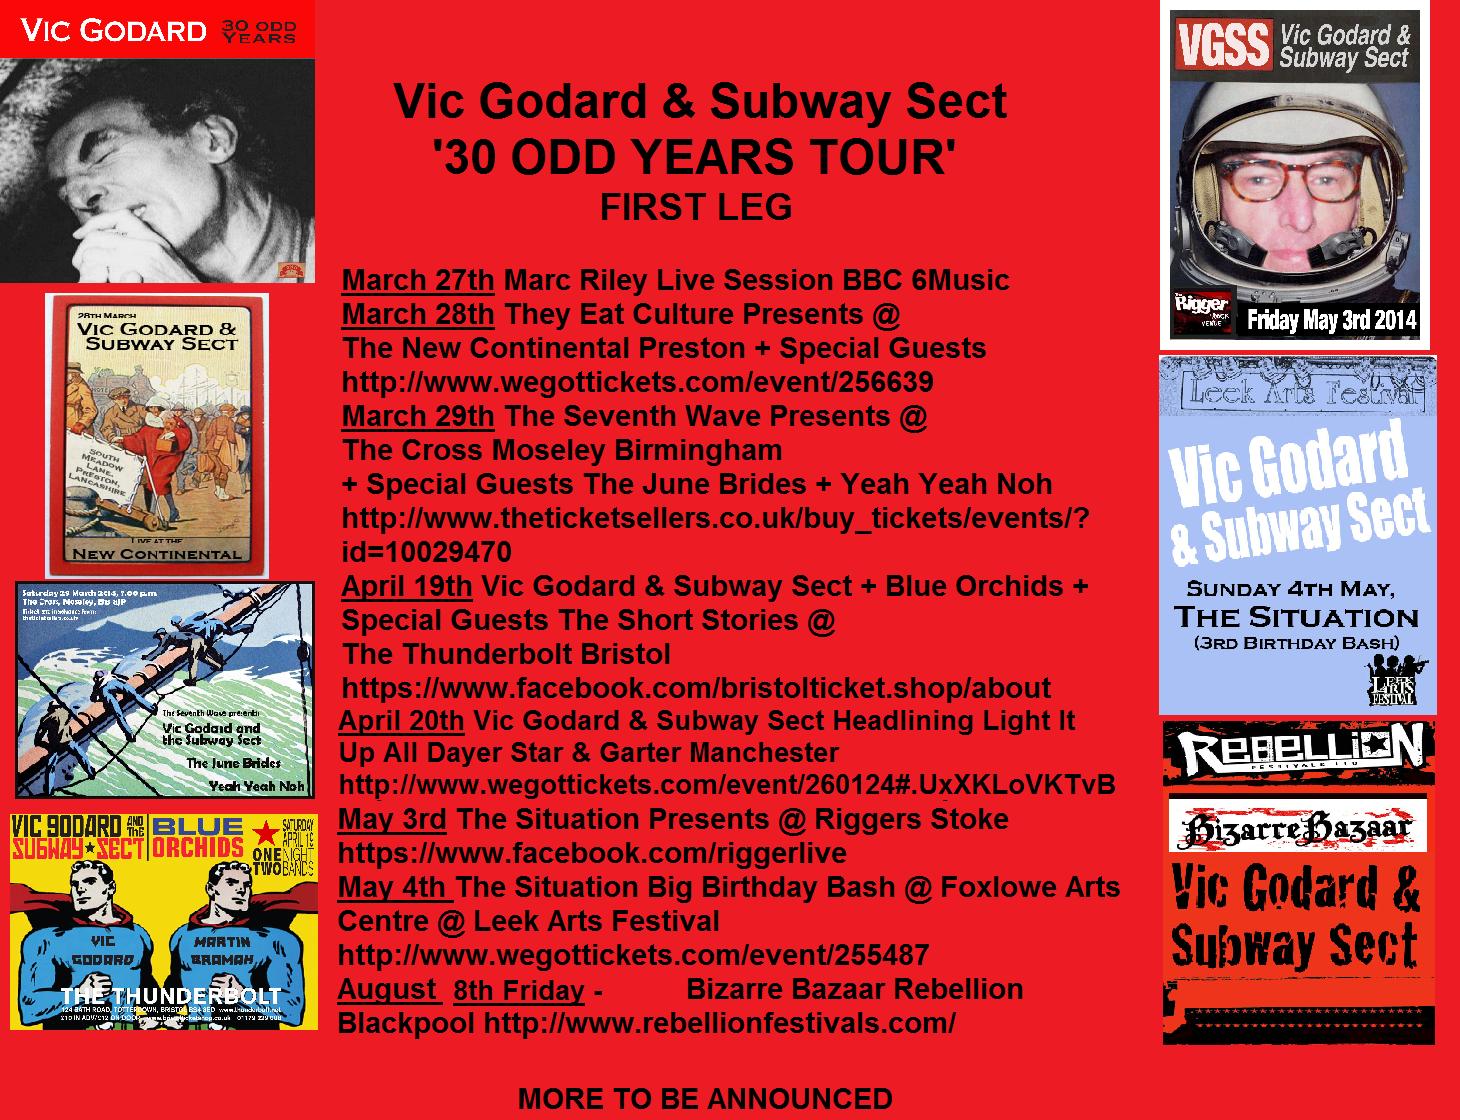 Vic Godard Subway Sect Split Up The Money